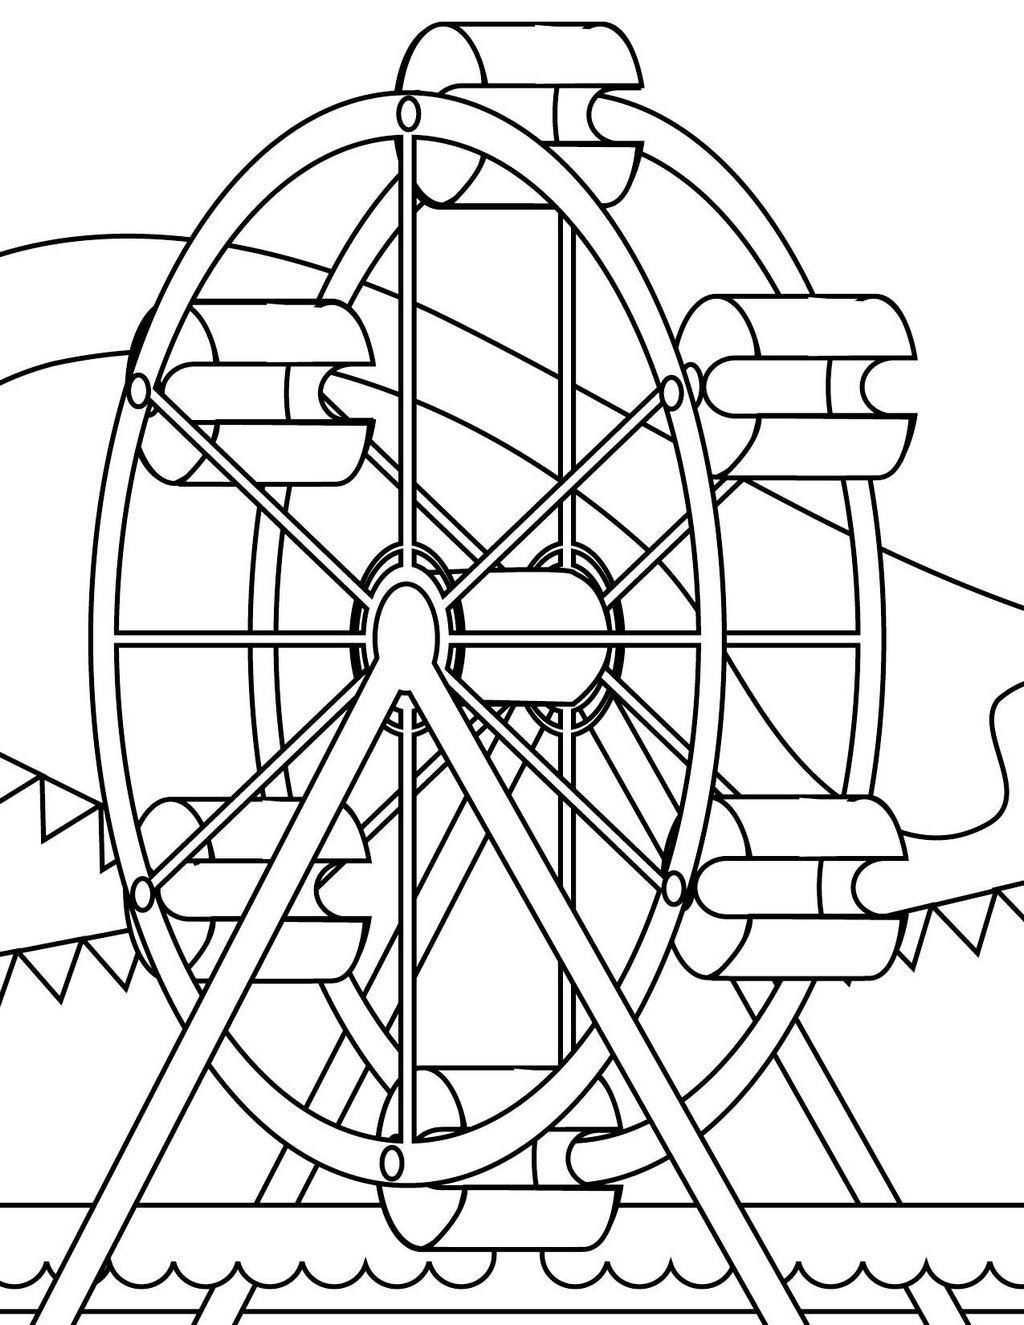 fun ferris wheel coloring sheet for kids